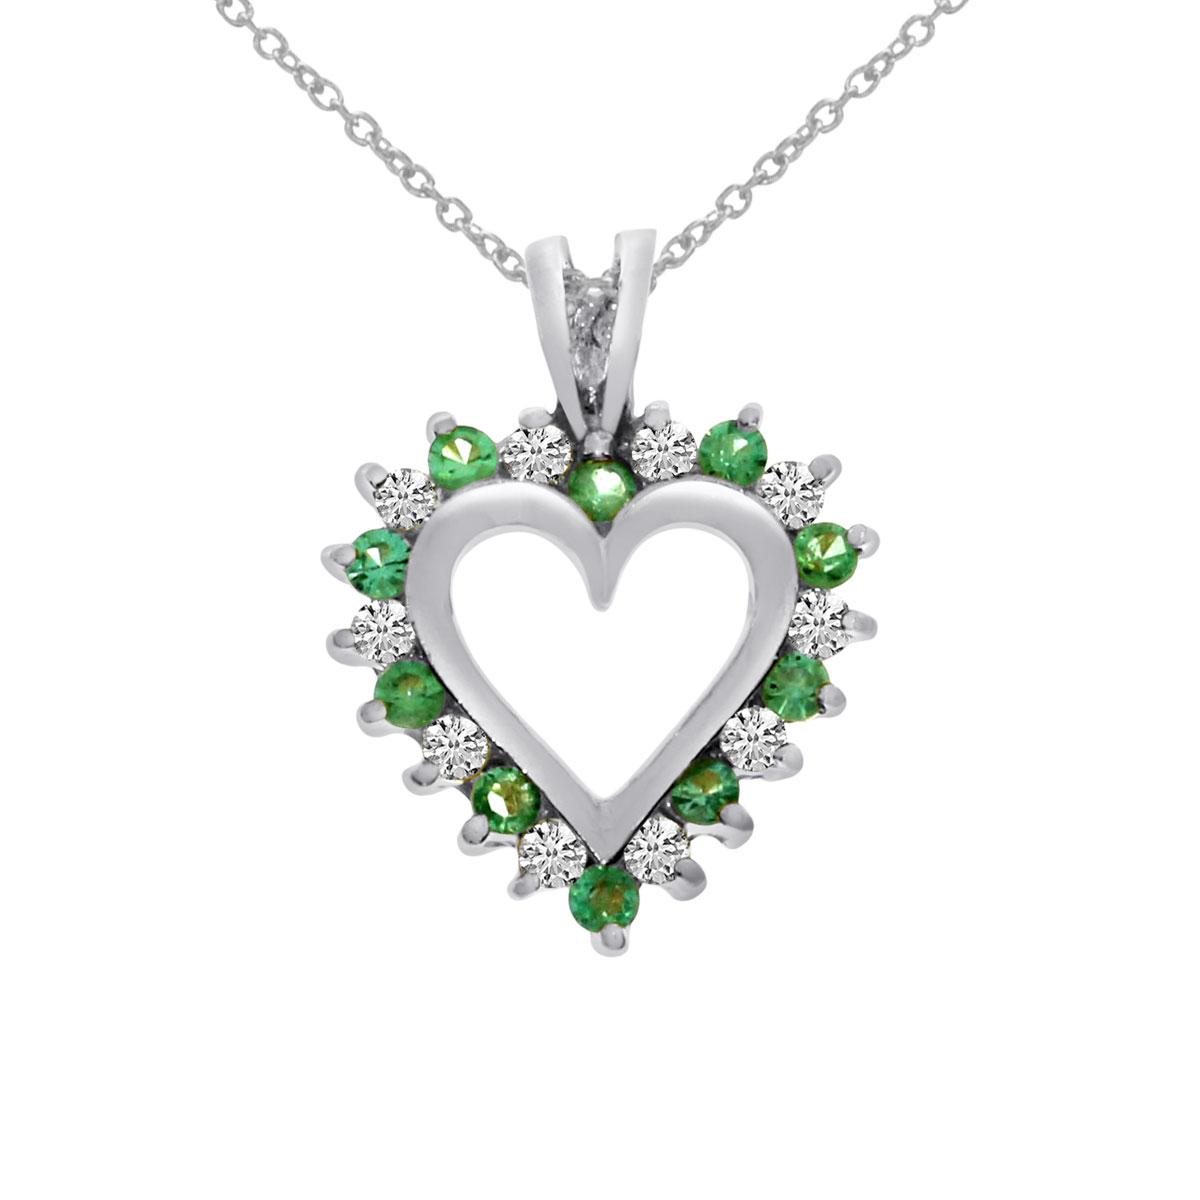 14k White Gold Emerald and Diamond Heart Shaped Pendant